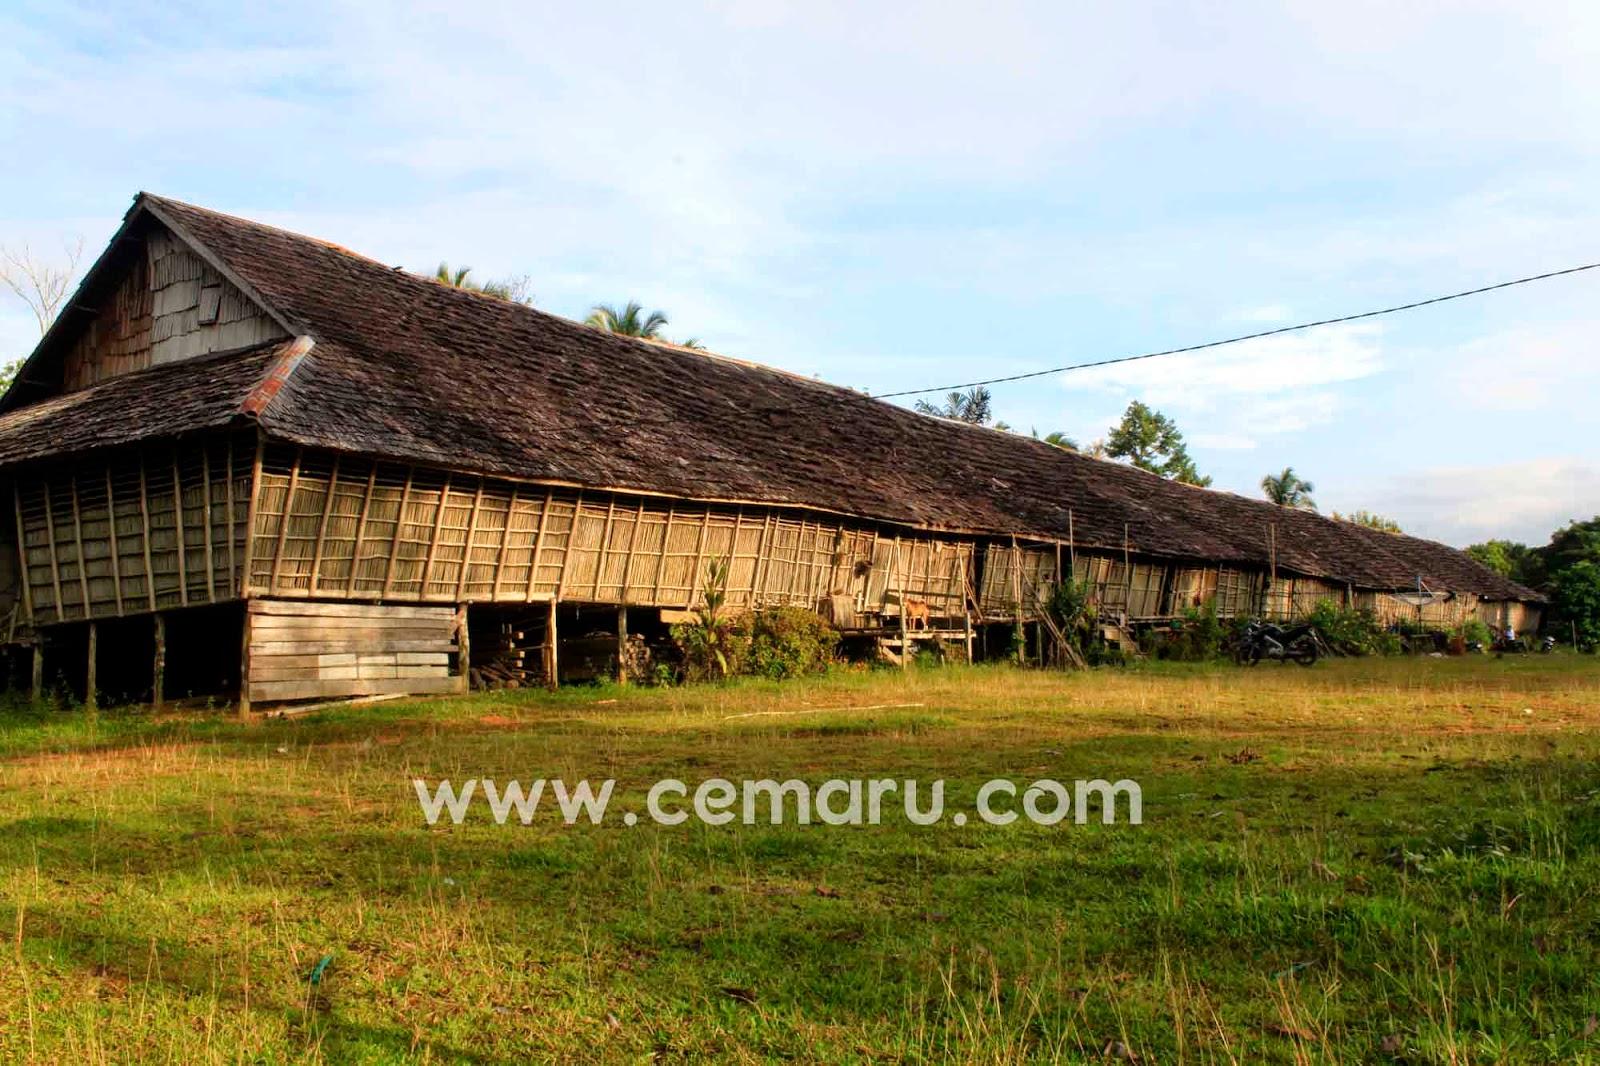 Rumah Betang Desa Ensaid Panjang, Sintang, Kalimantan Barat